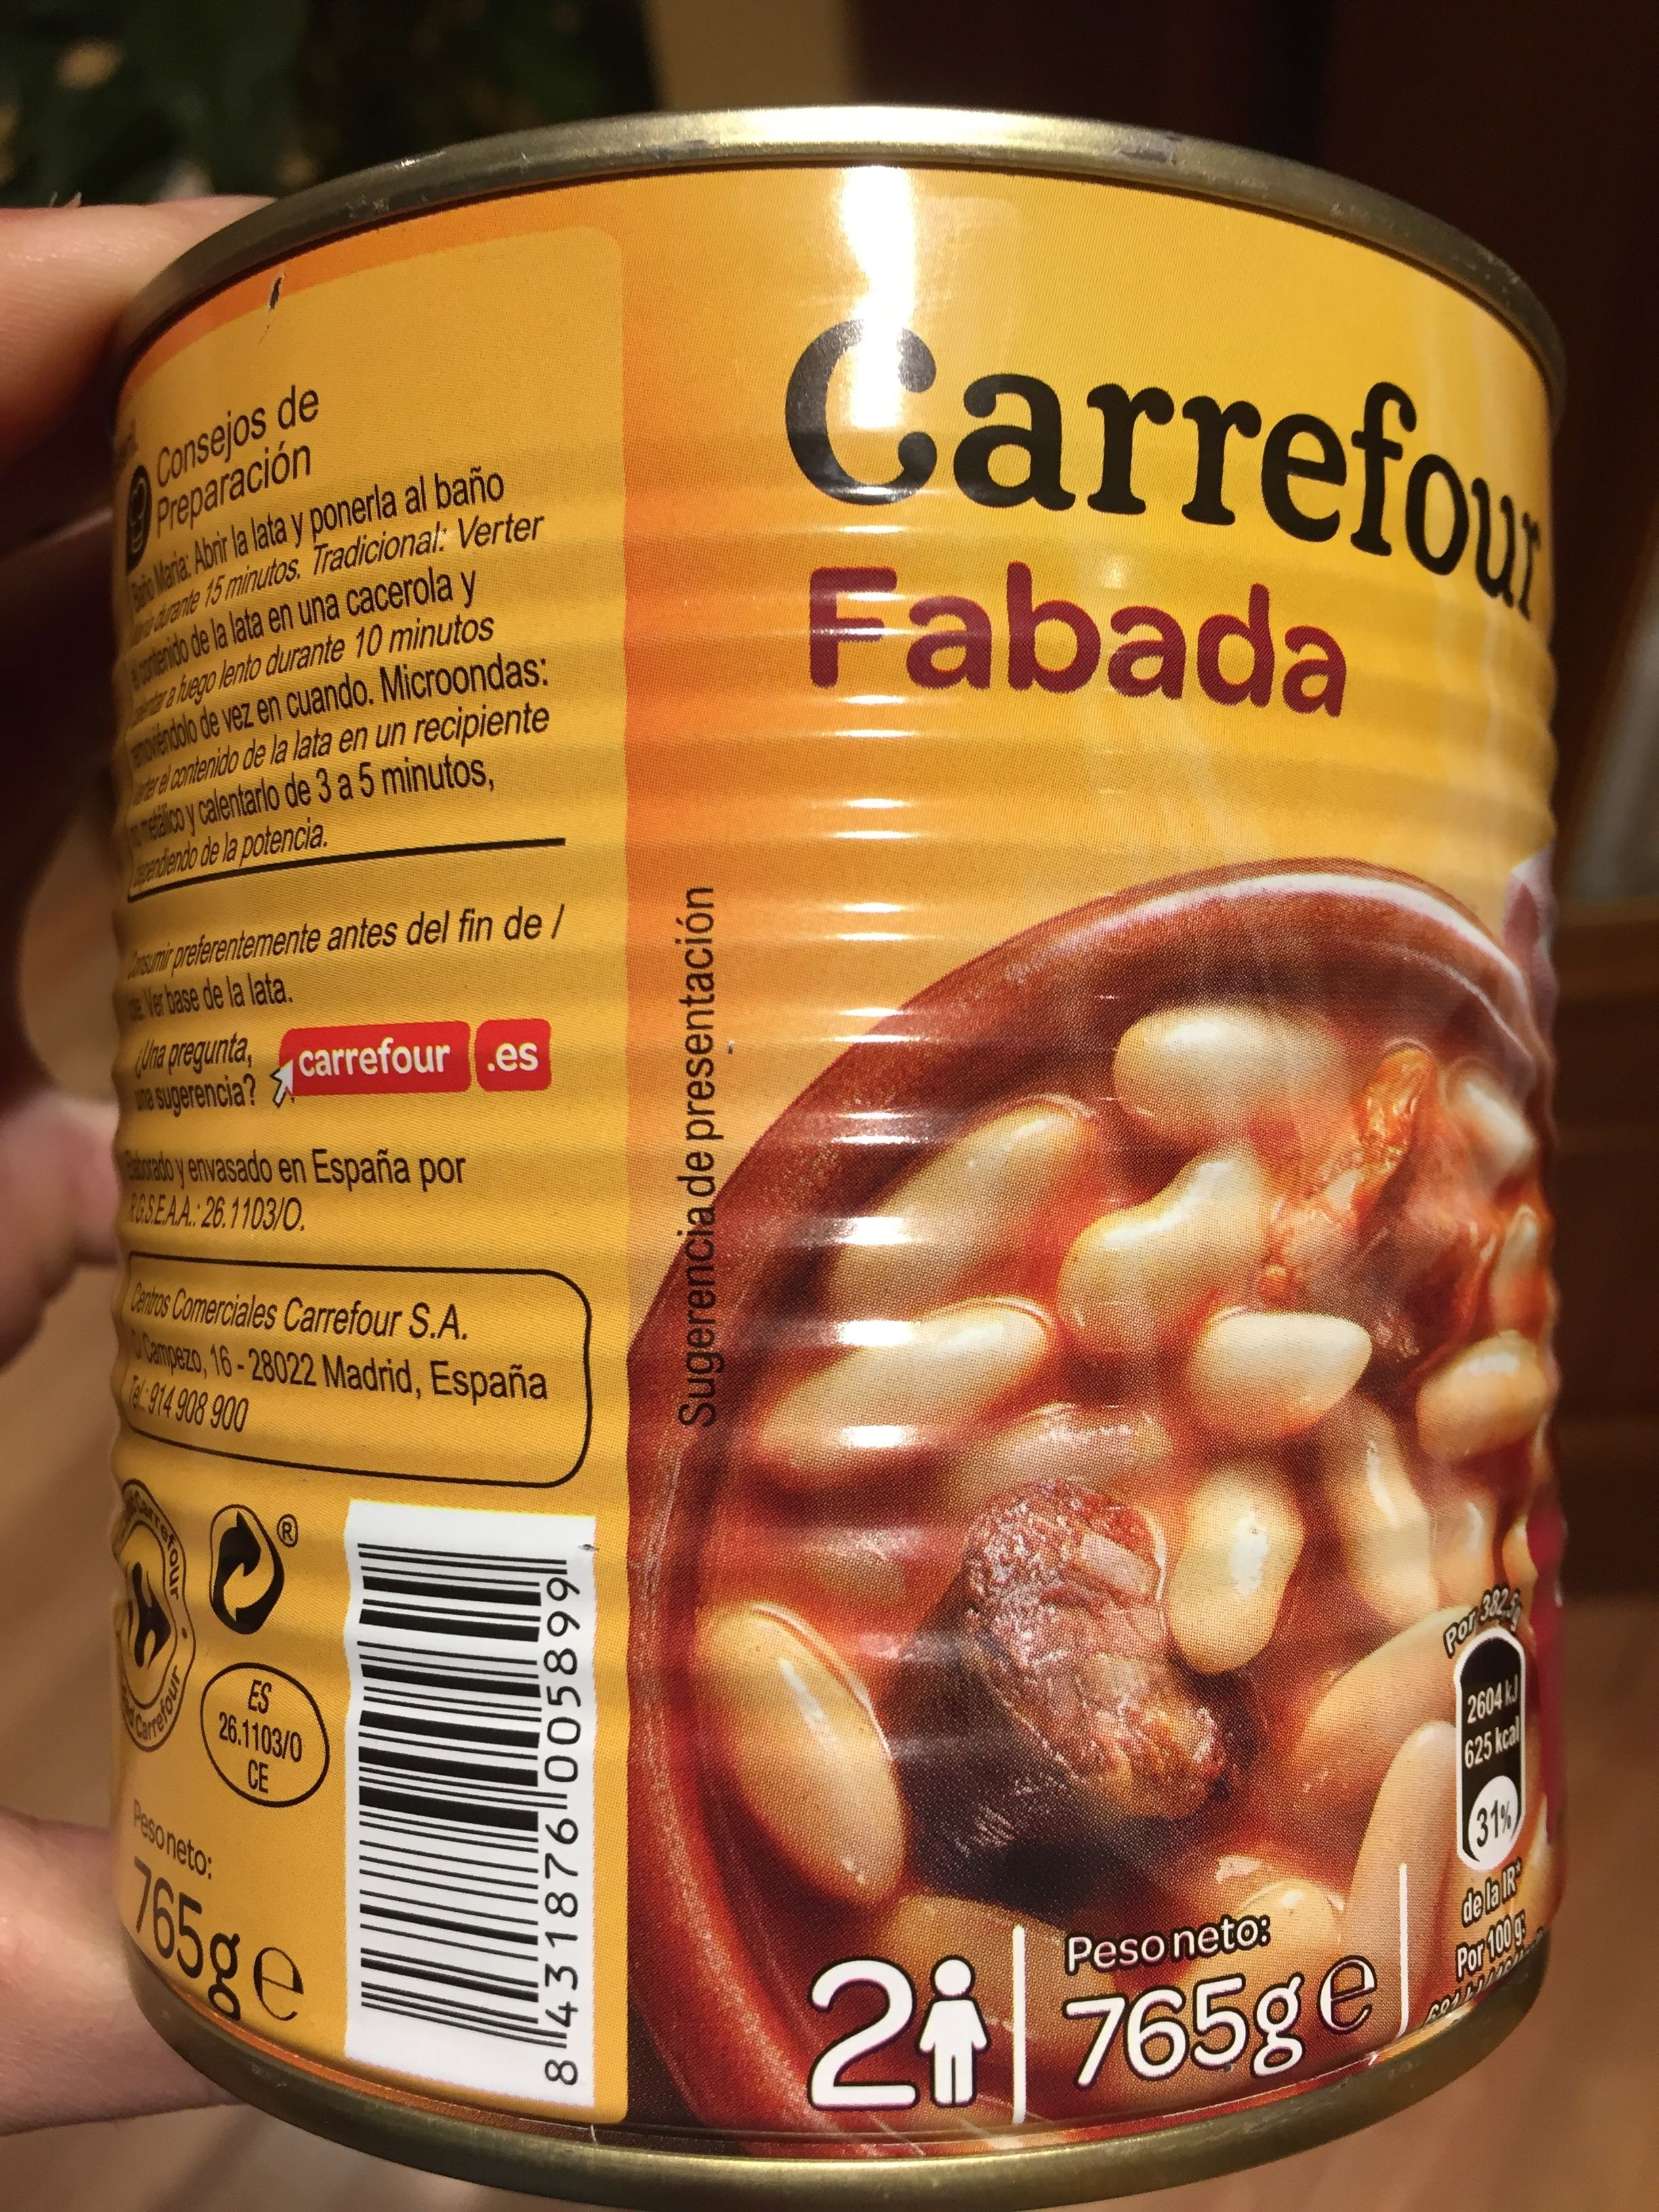 Carrefour Bano.Carrefour